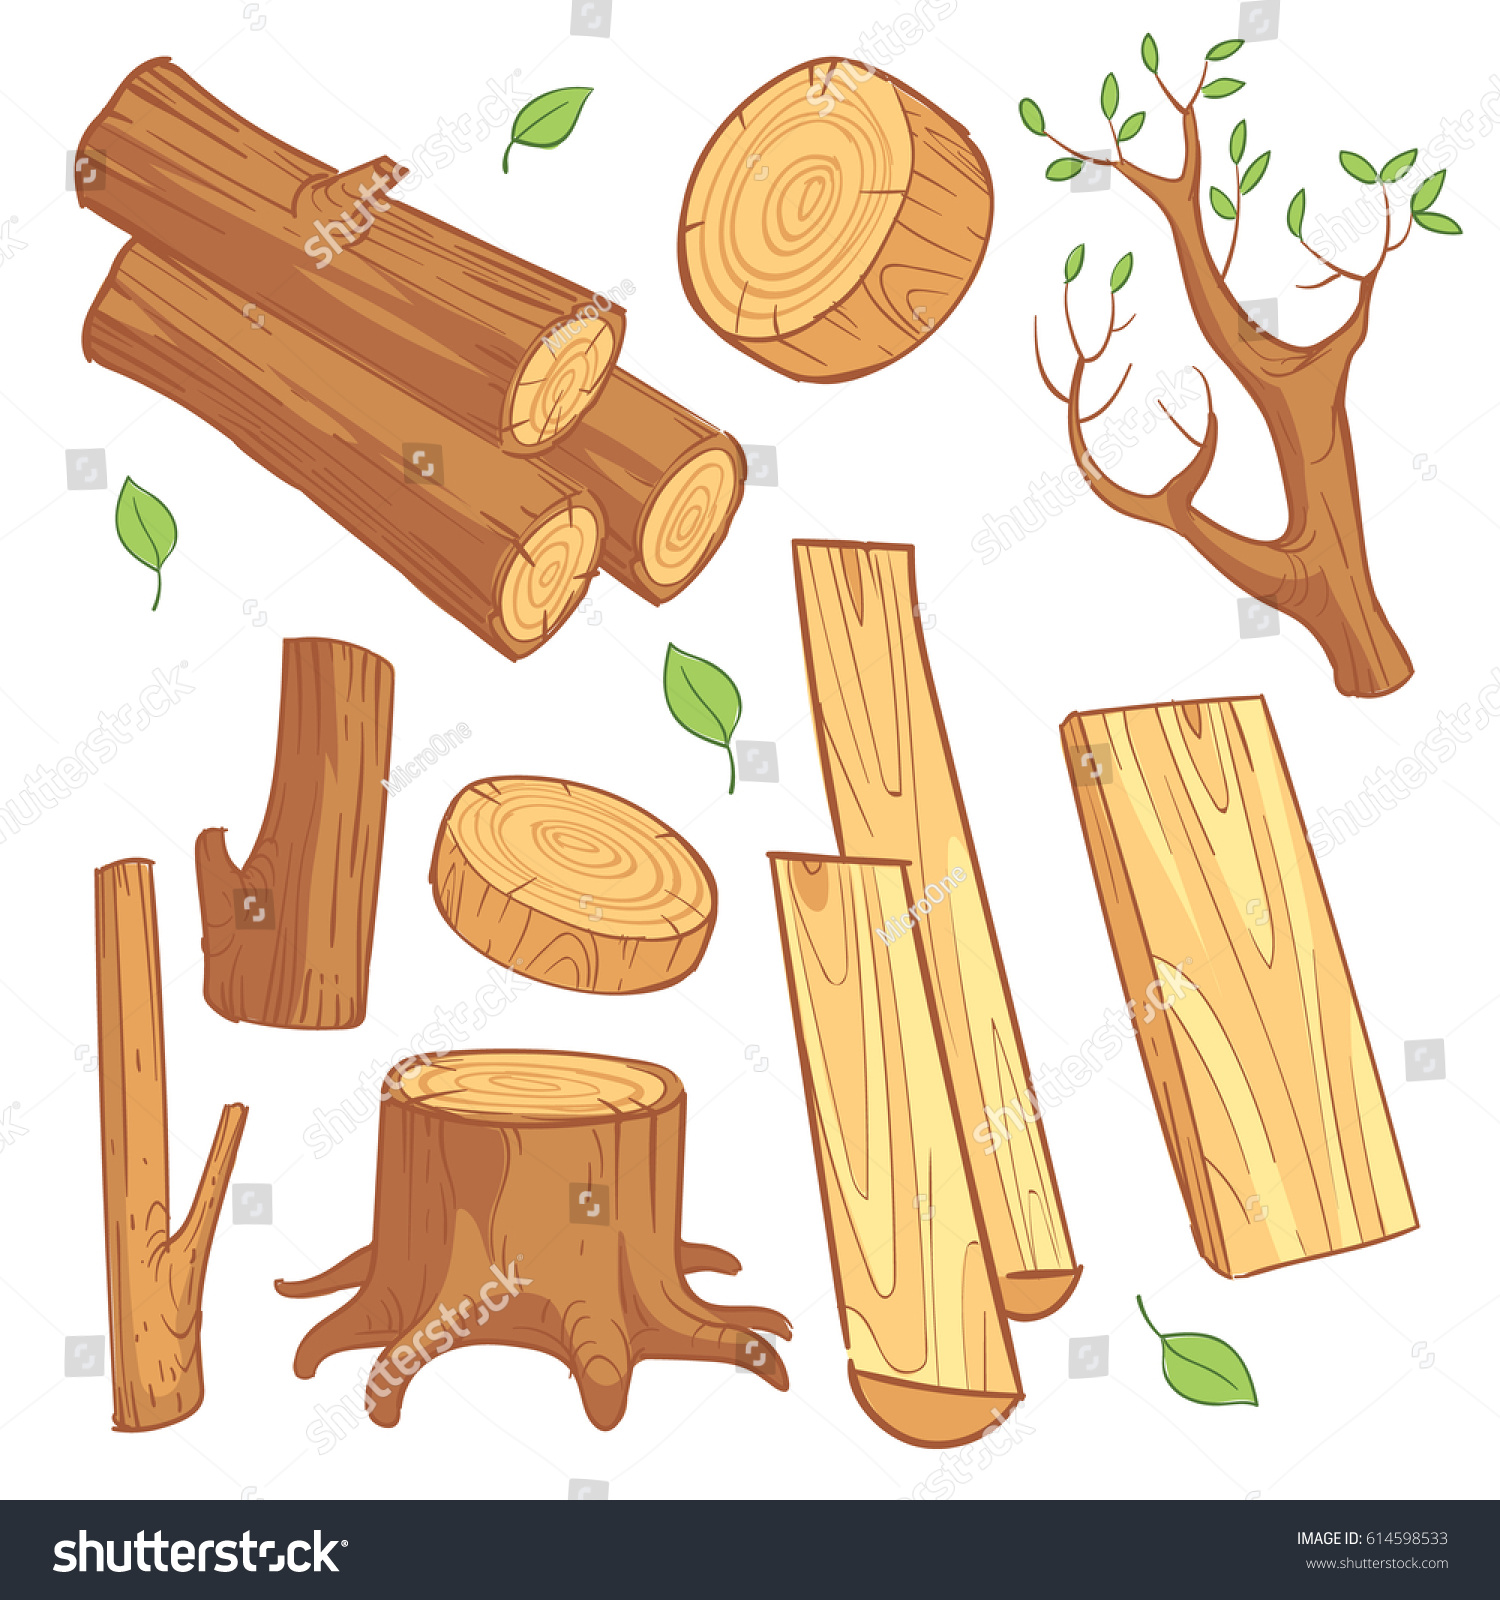 Wood Log Cartoon ~ Cartoon wooden materials lumber firewood wood stock vector